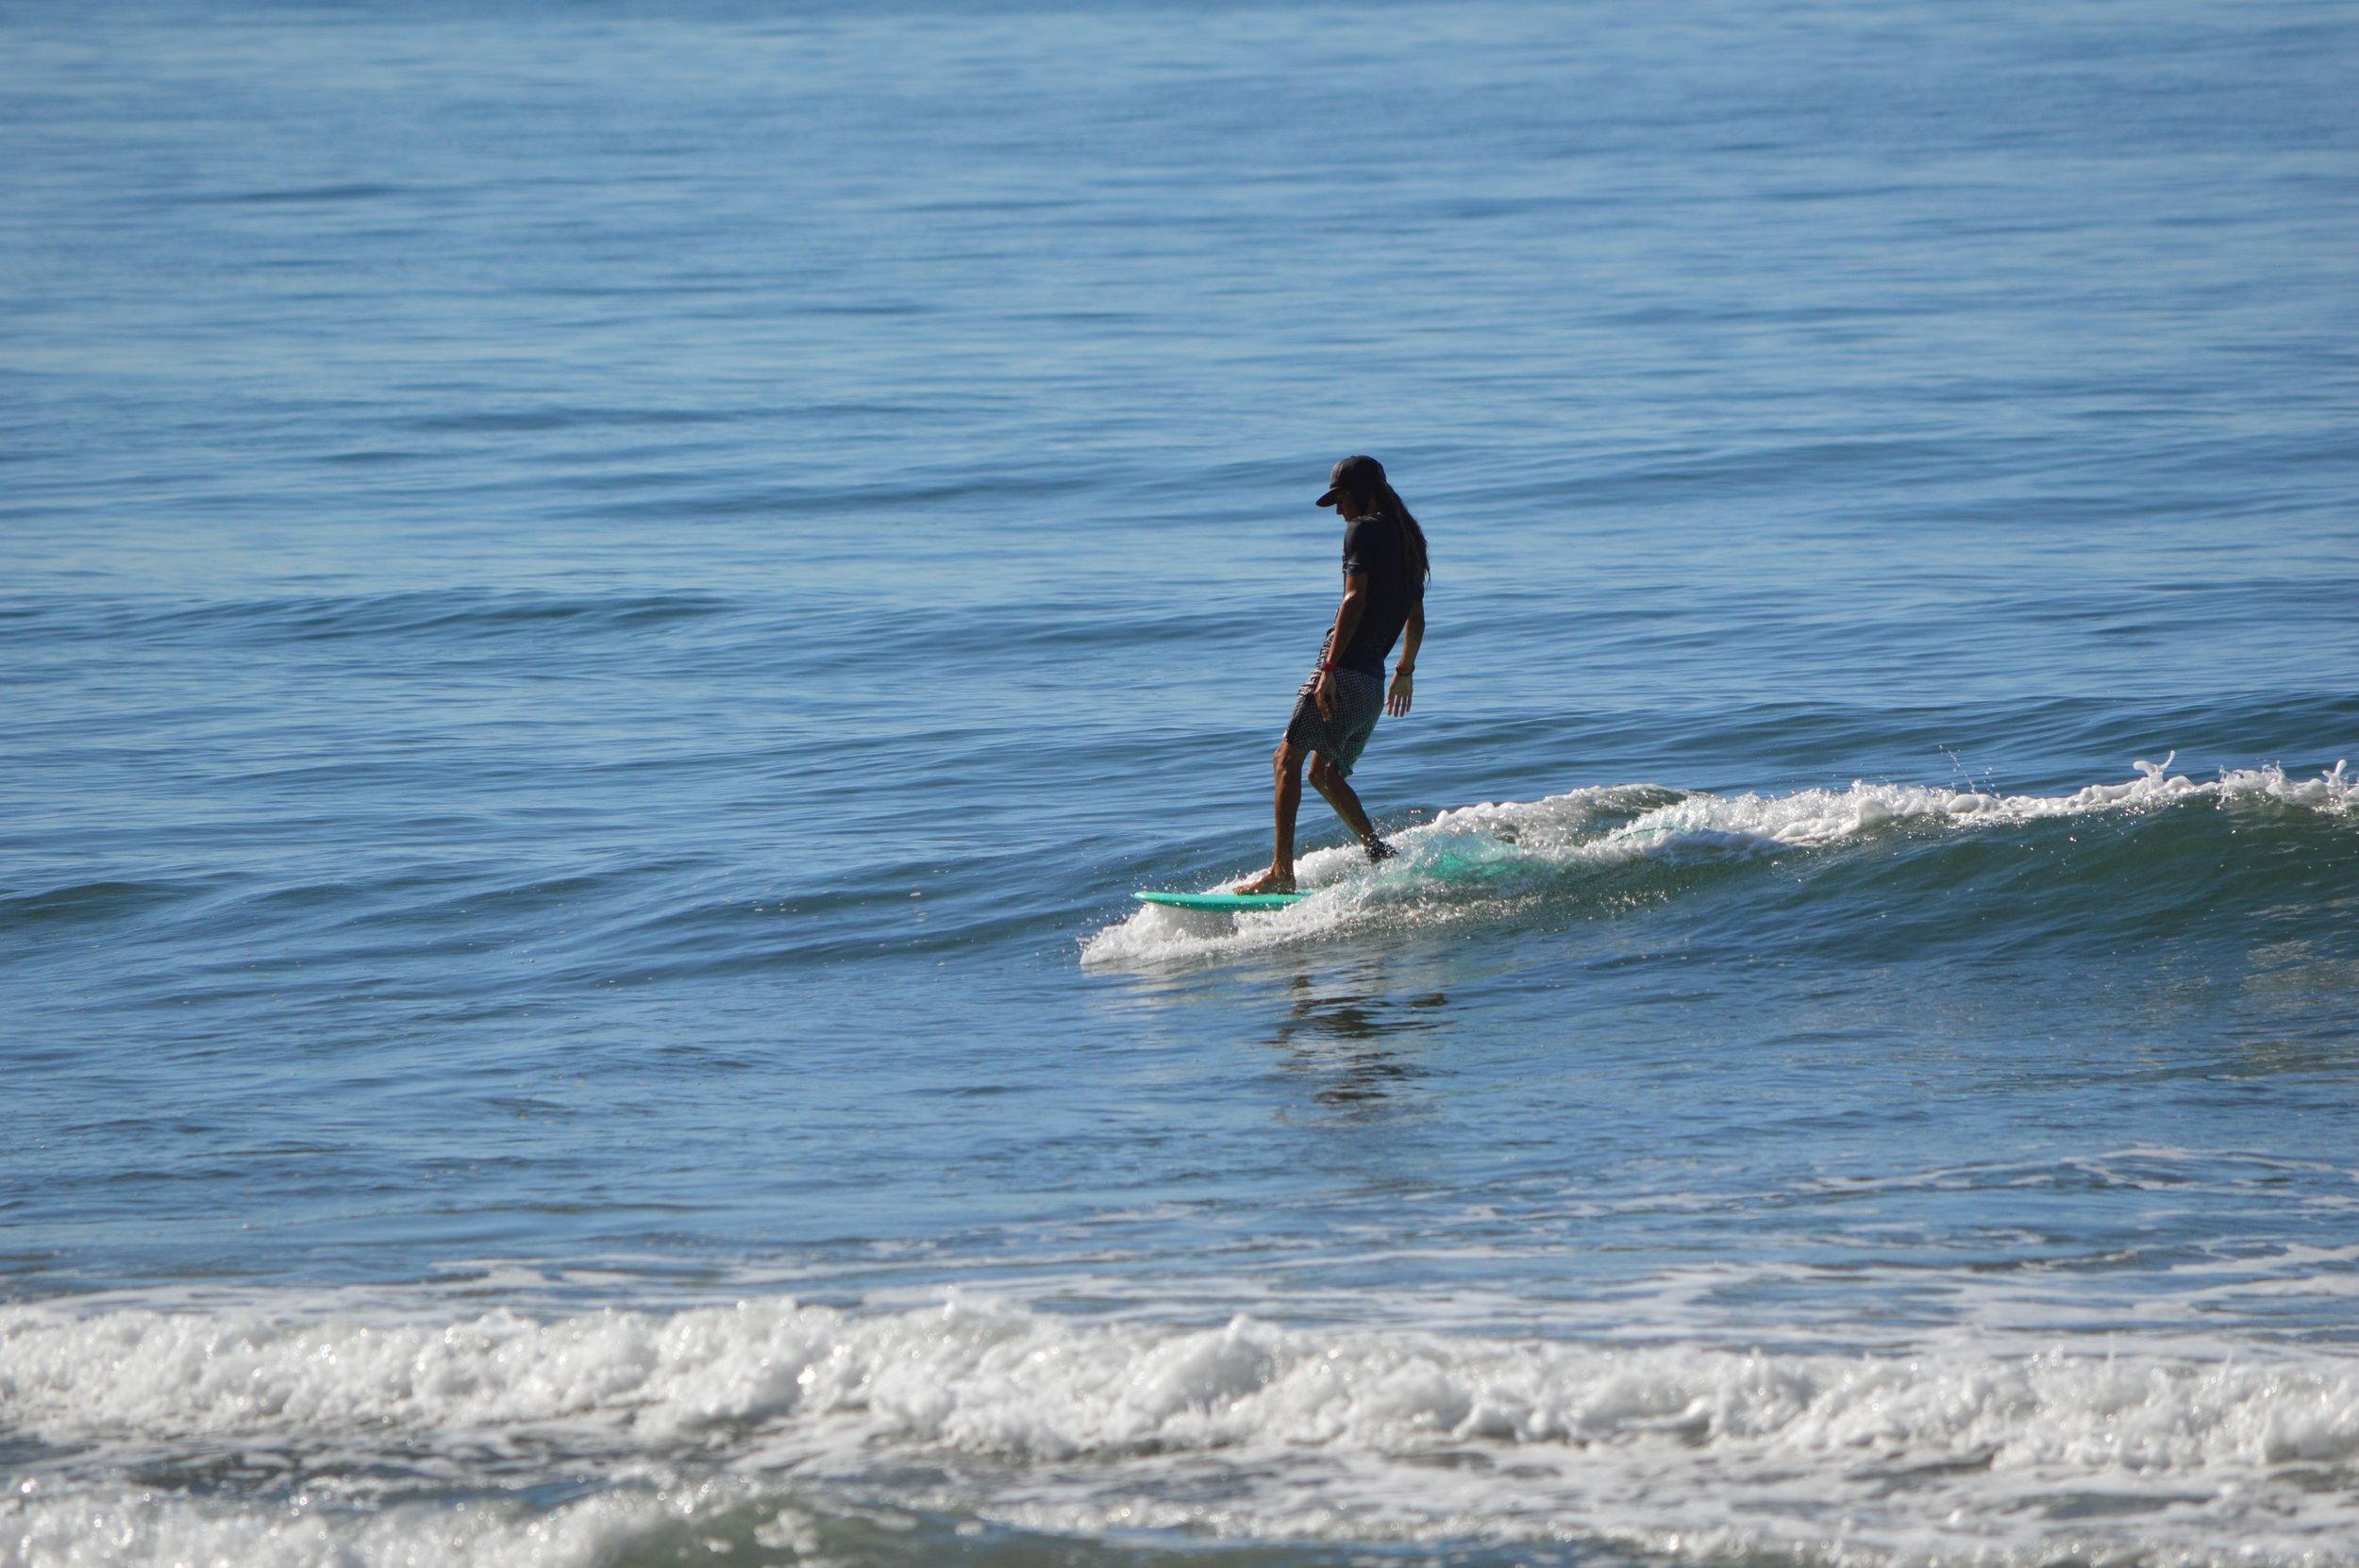 costa-rica-surf-1 - Copy.JPG